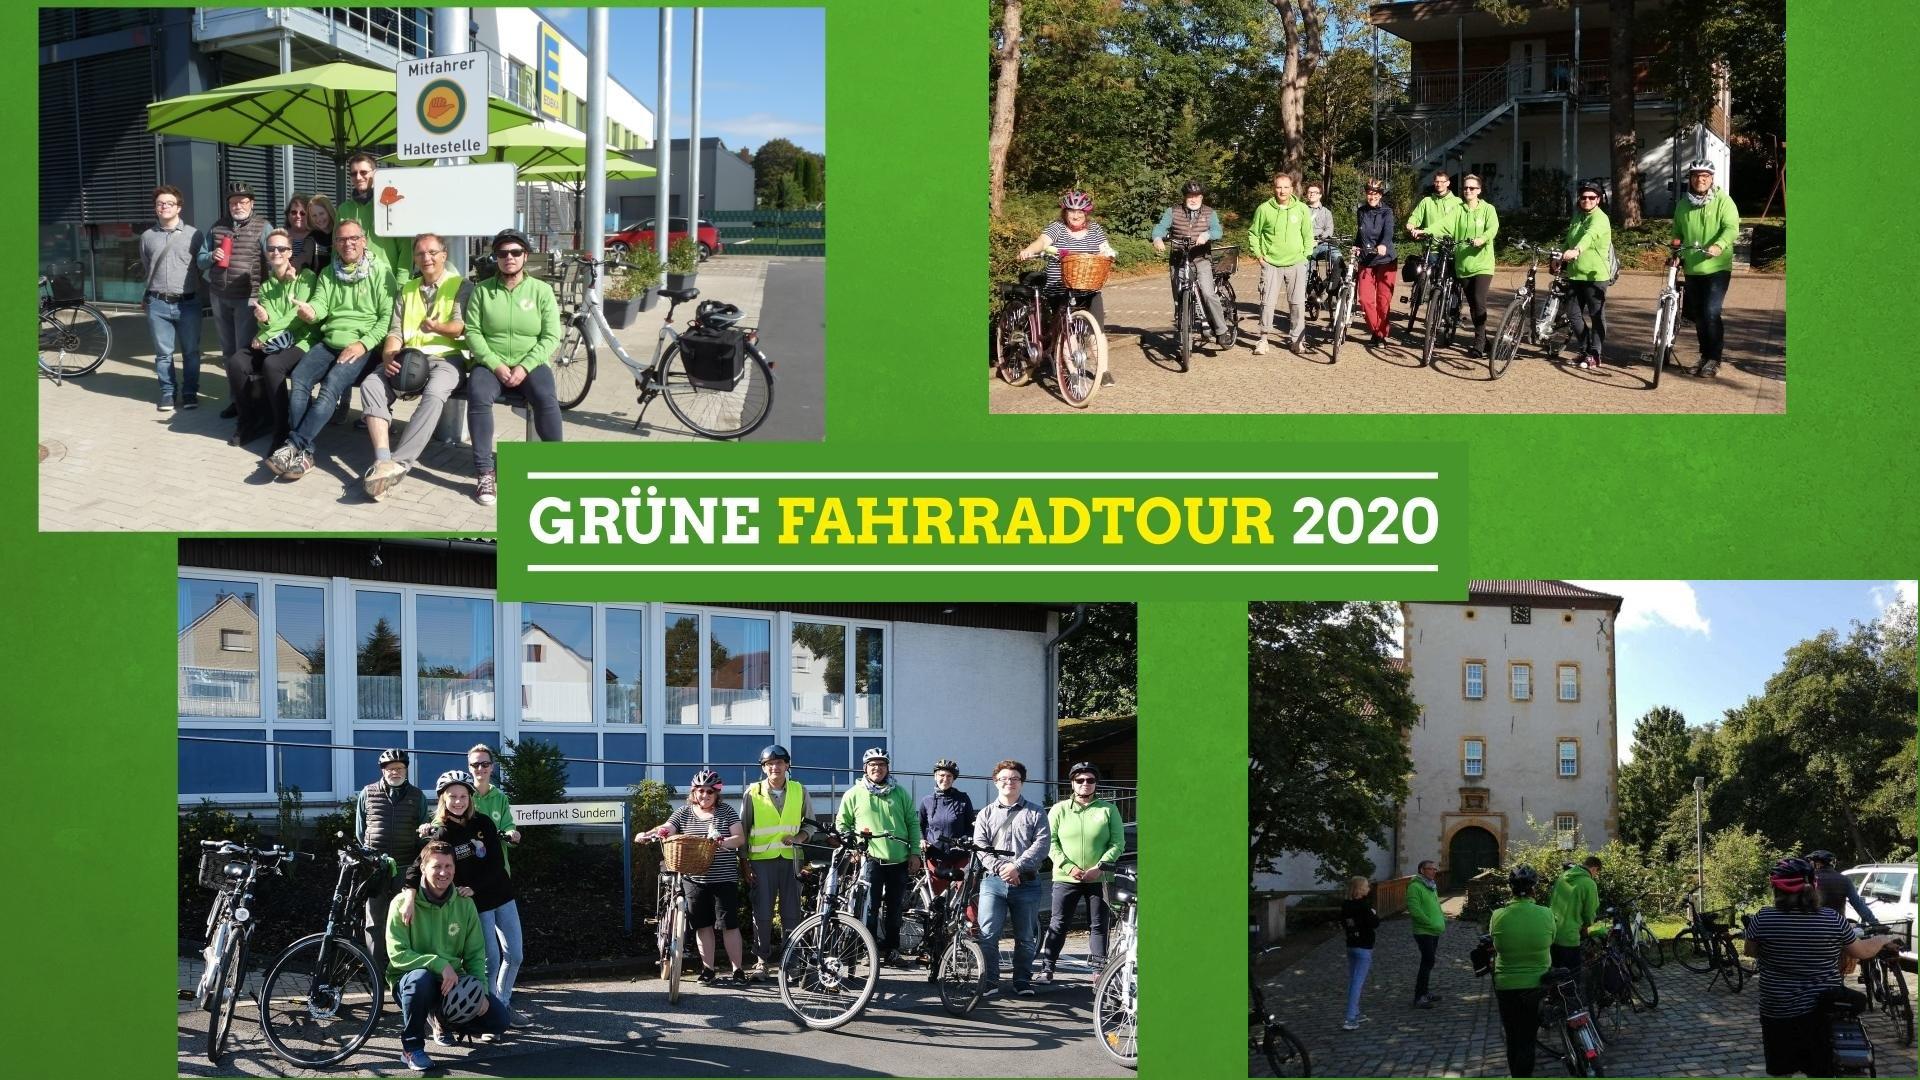 Grüne Fahrradtour 2020